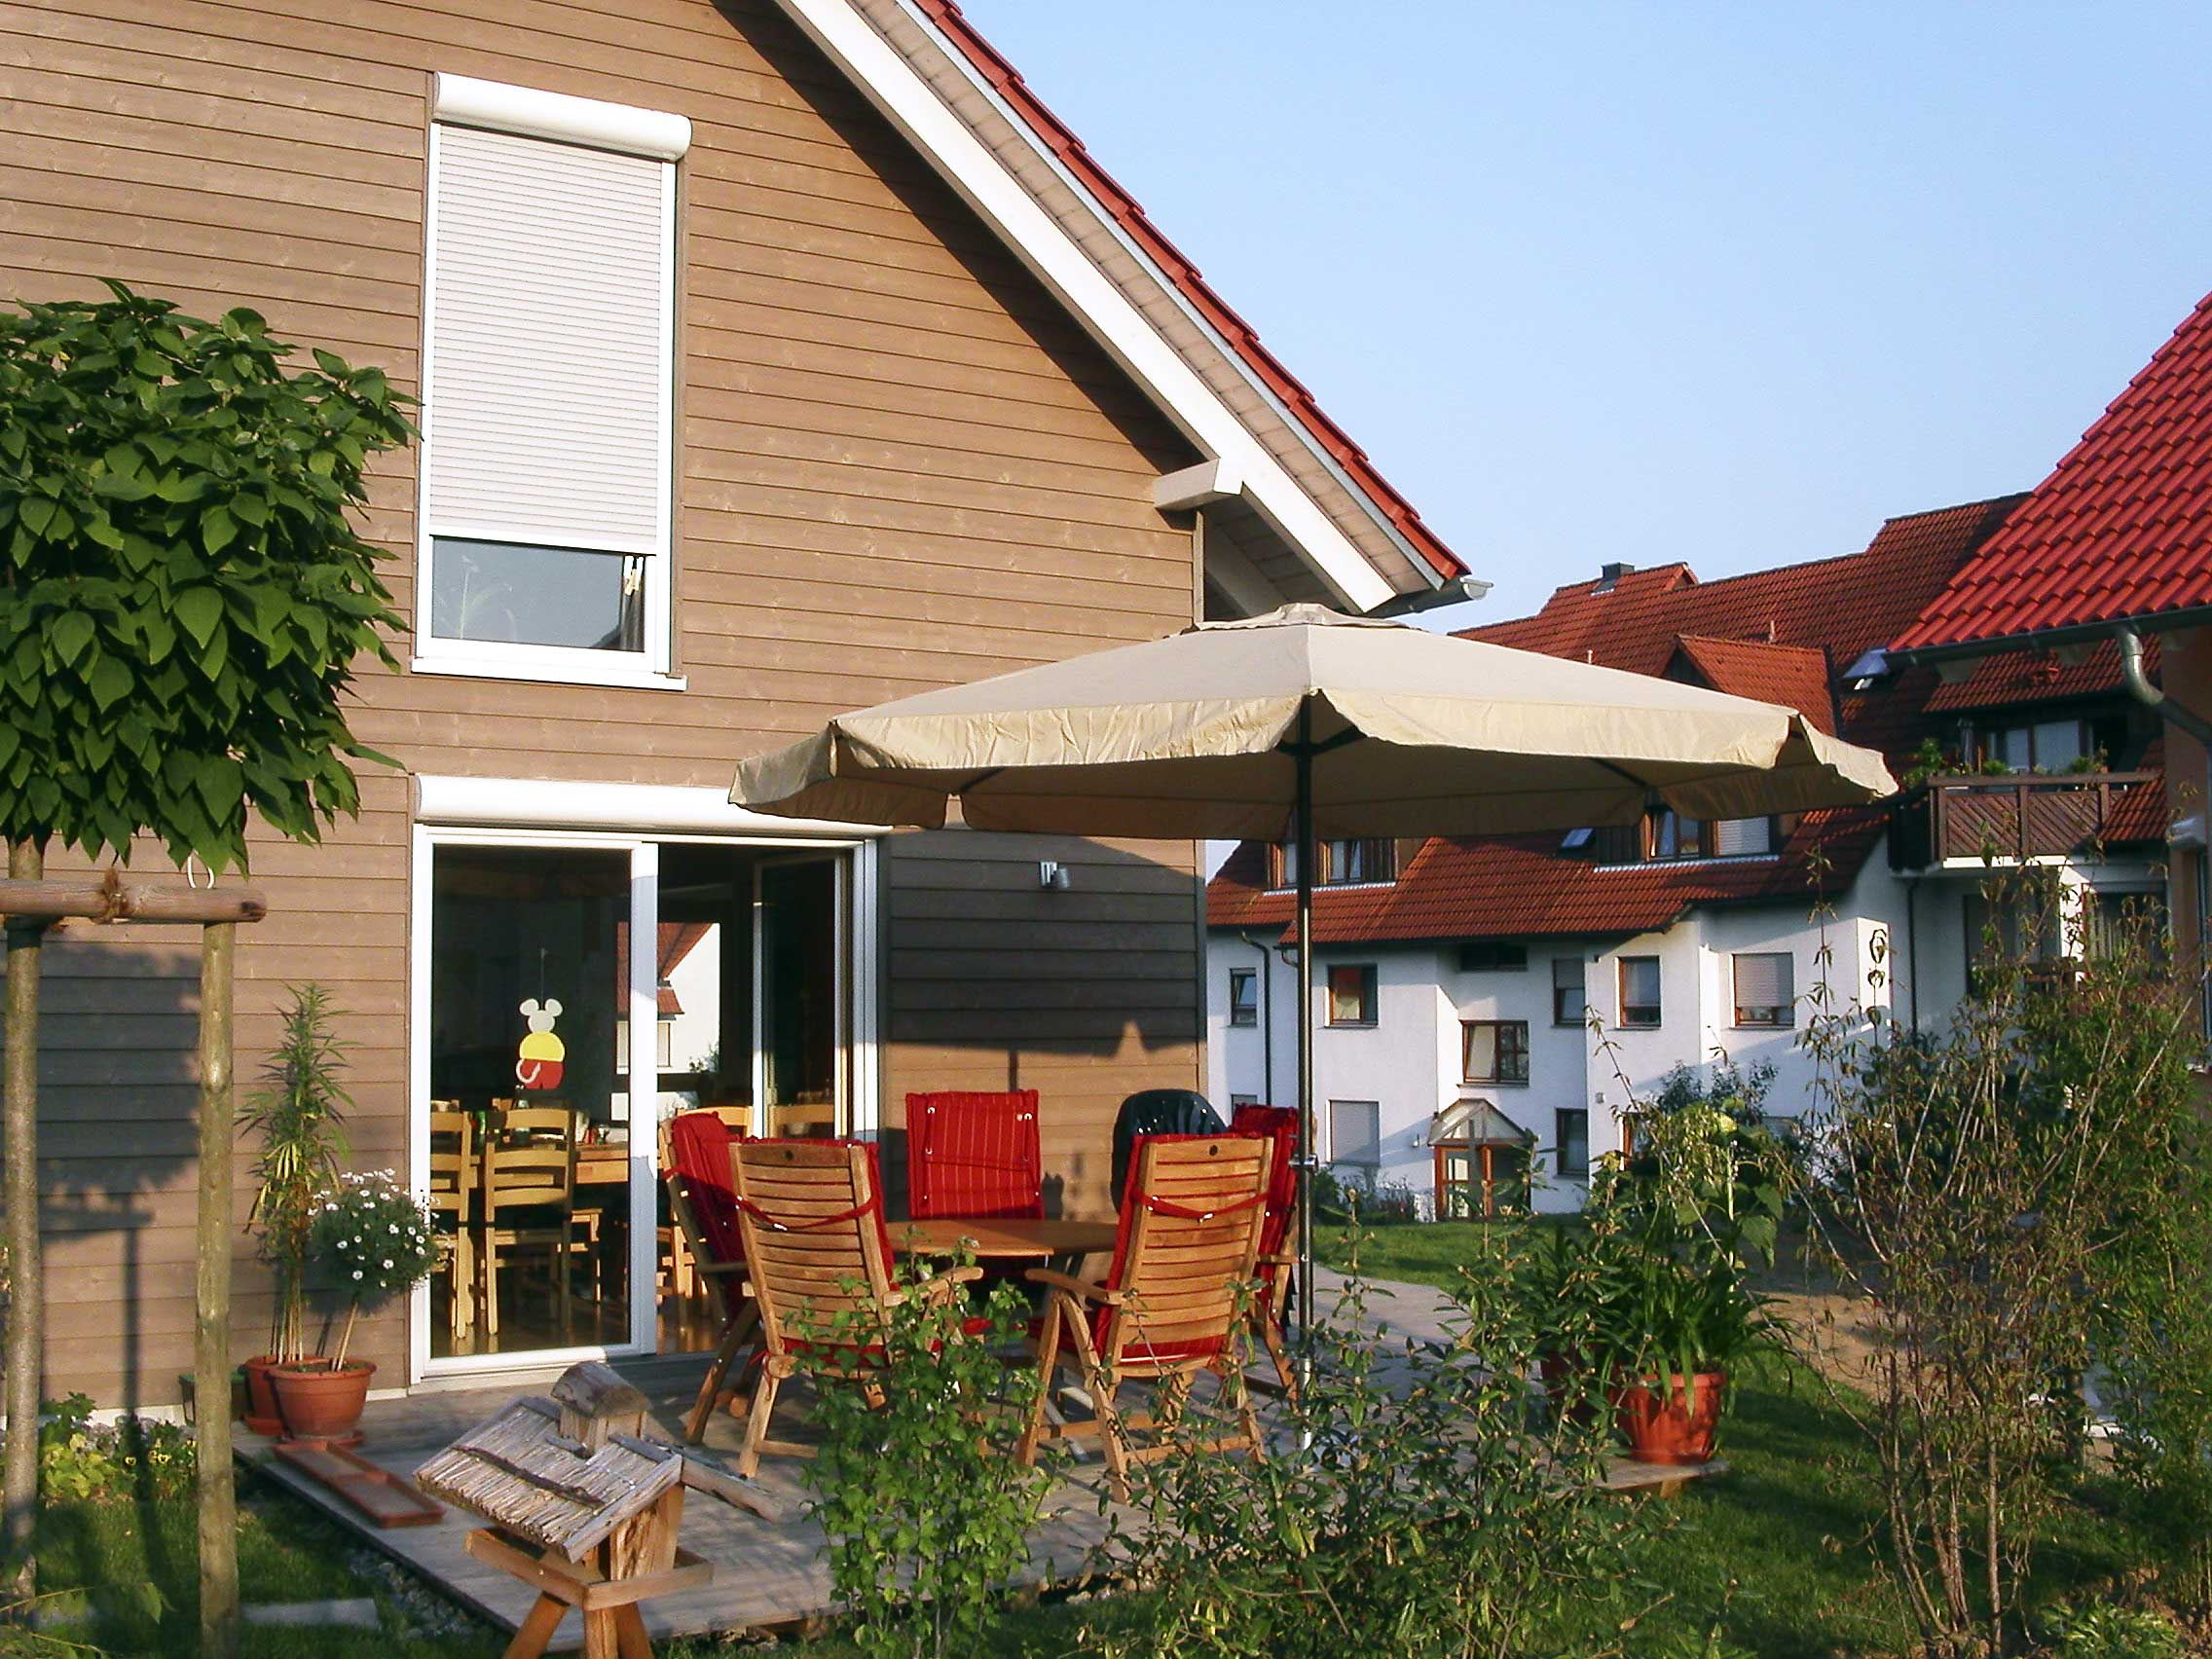 Grnes Wohnzimmer Ludwigsburg Lila Norderney